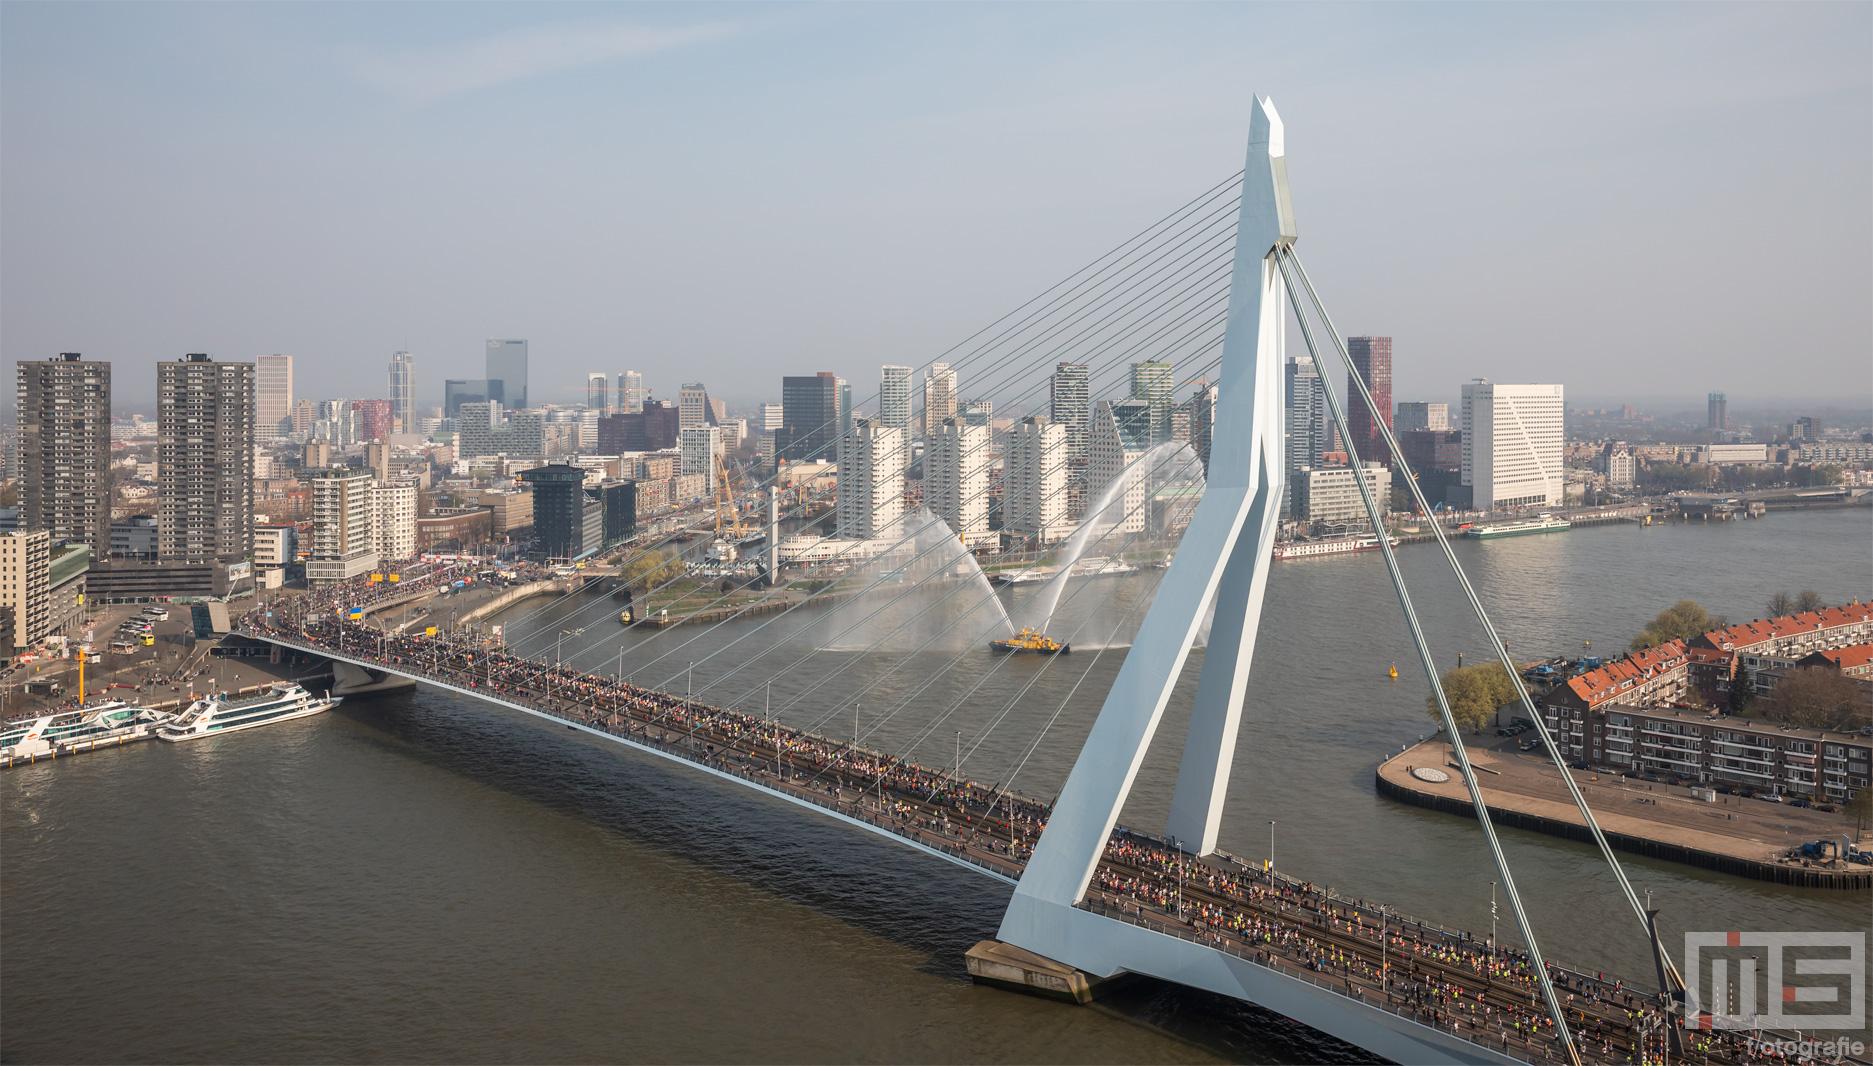 NN Marathon Rotterdam 2019 Cover